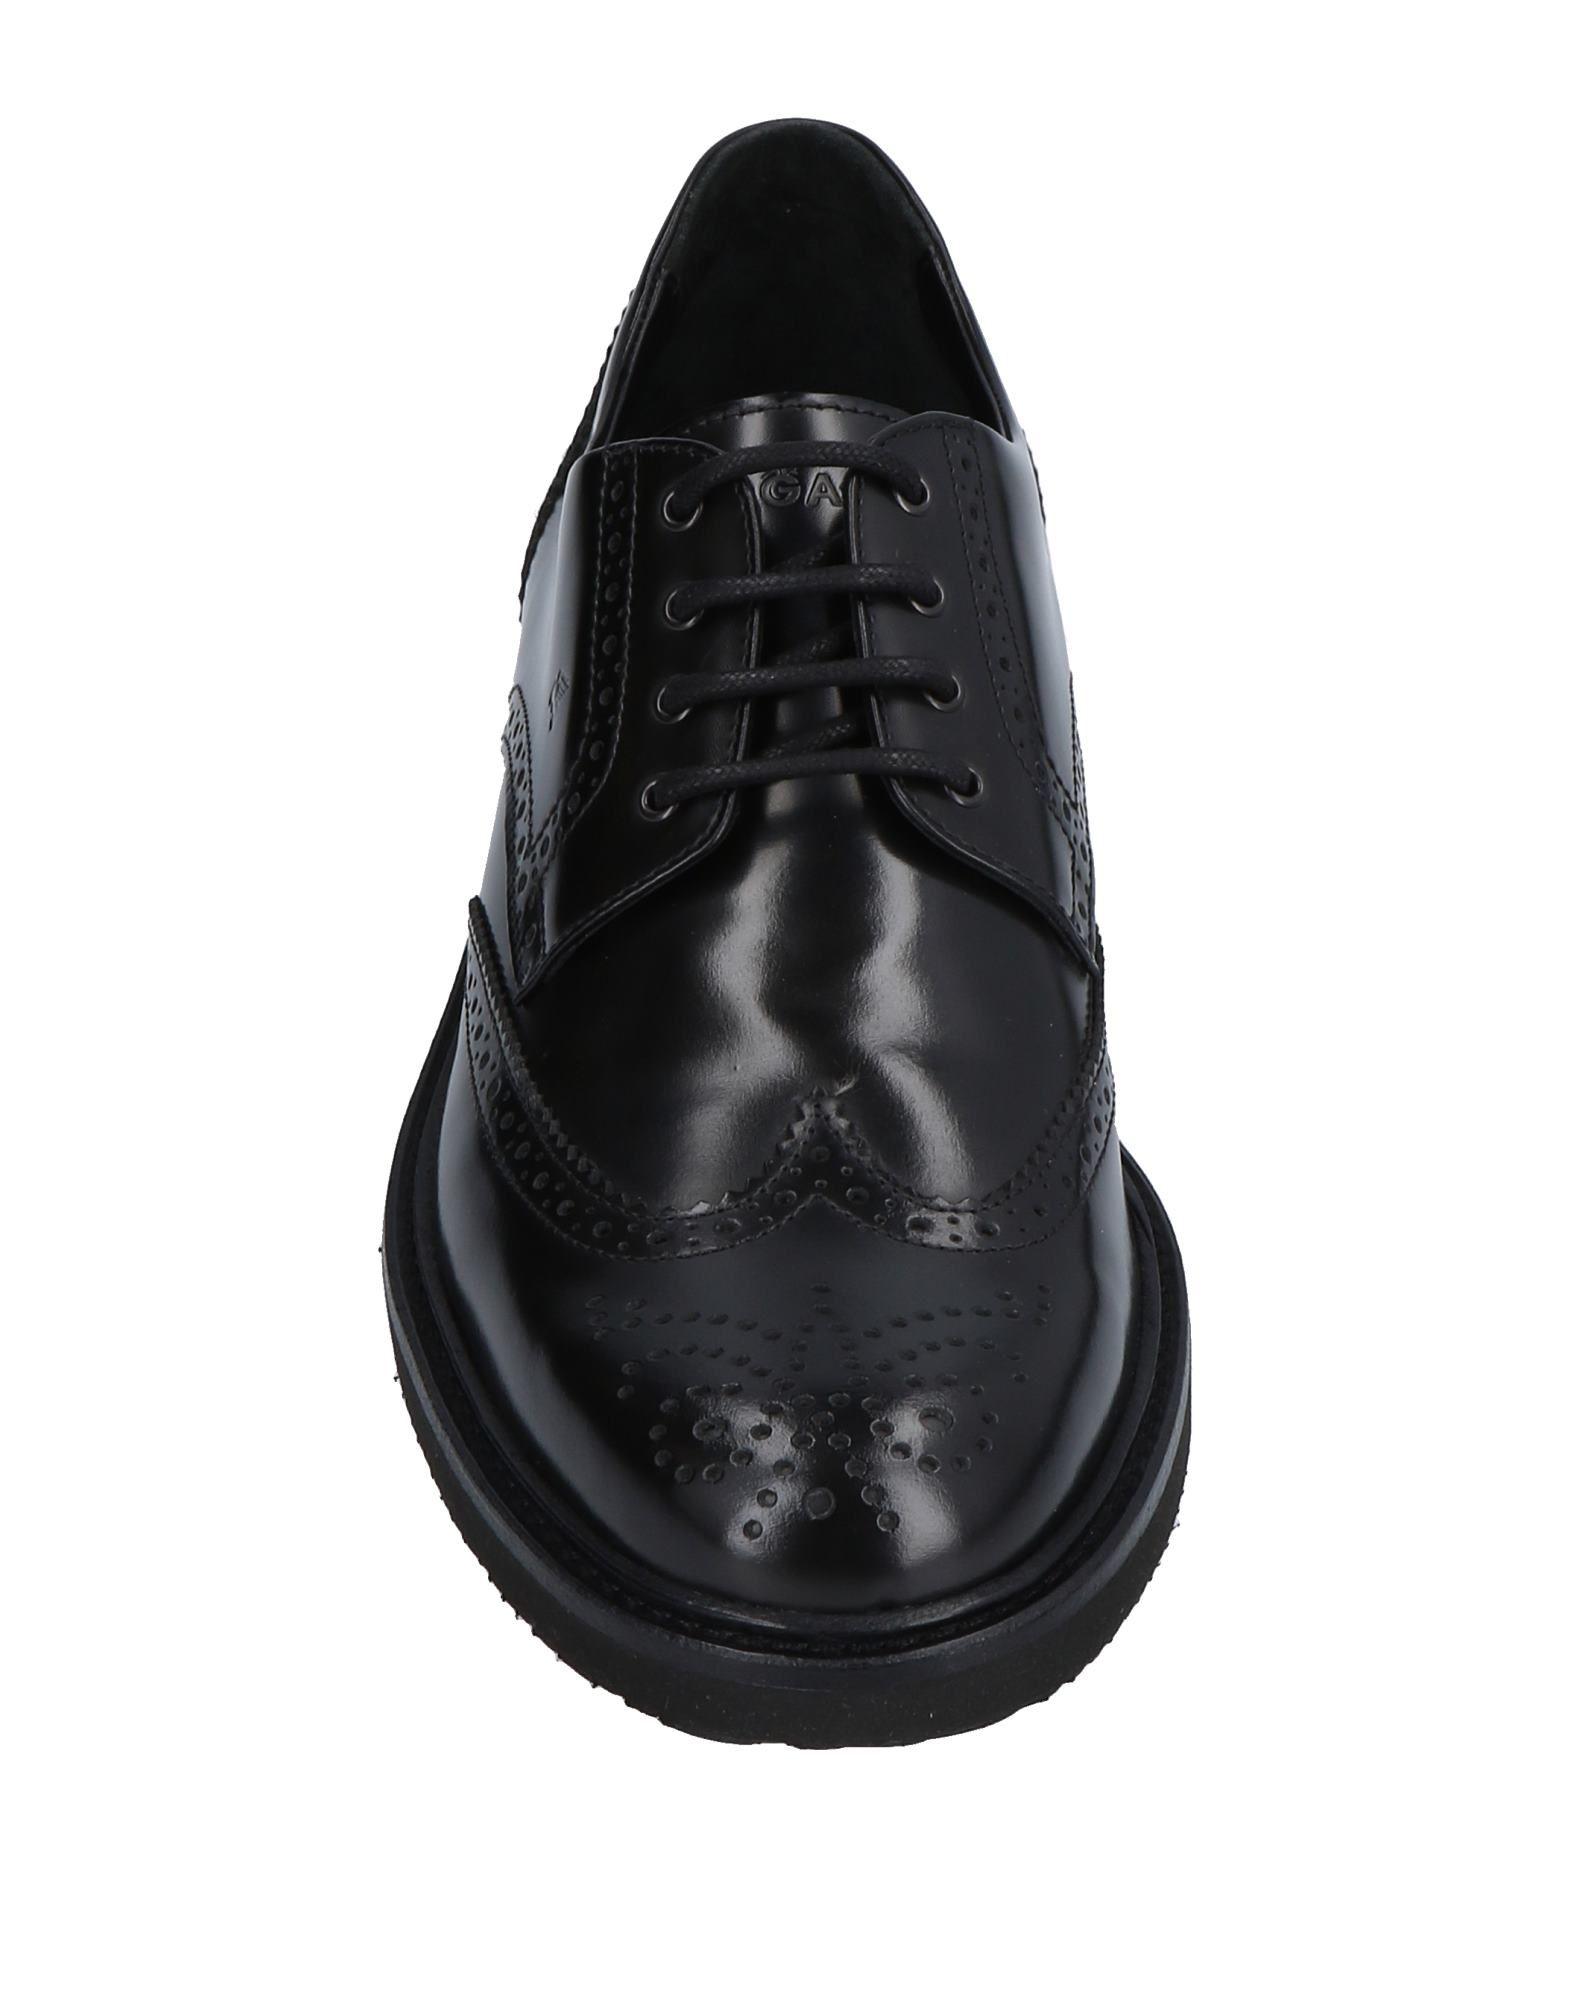 Hogan 11520259IV Schnürschuhe Herren  11520259IV Hogan Gute Qualität beliebte Schuhe 02dc8b